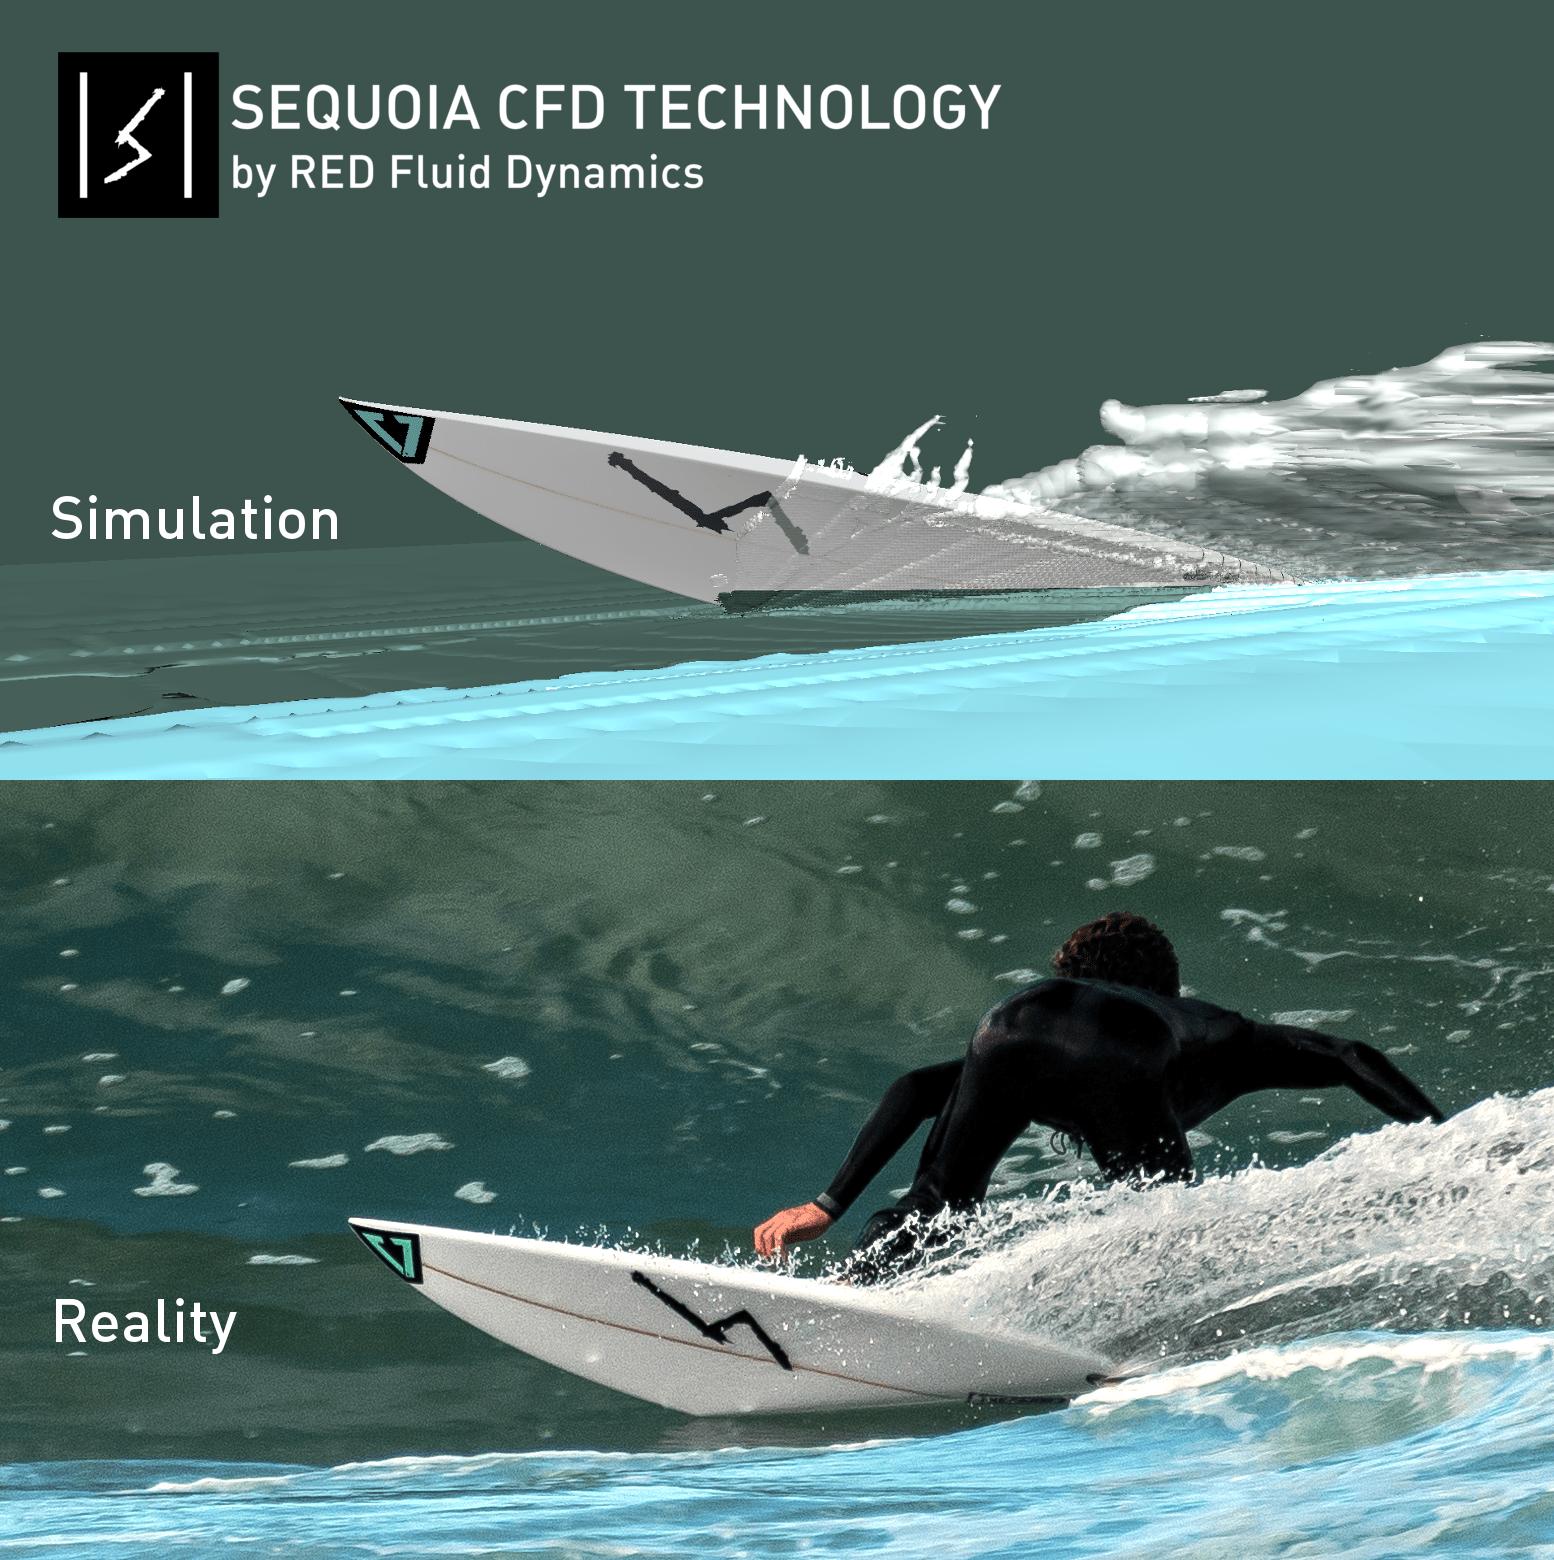 Sequoia CFD surfboards Enzo